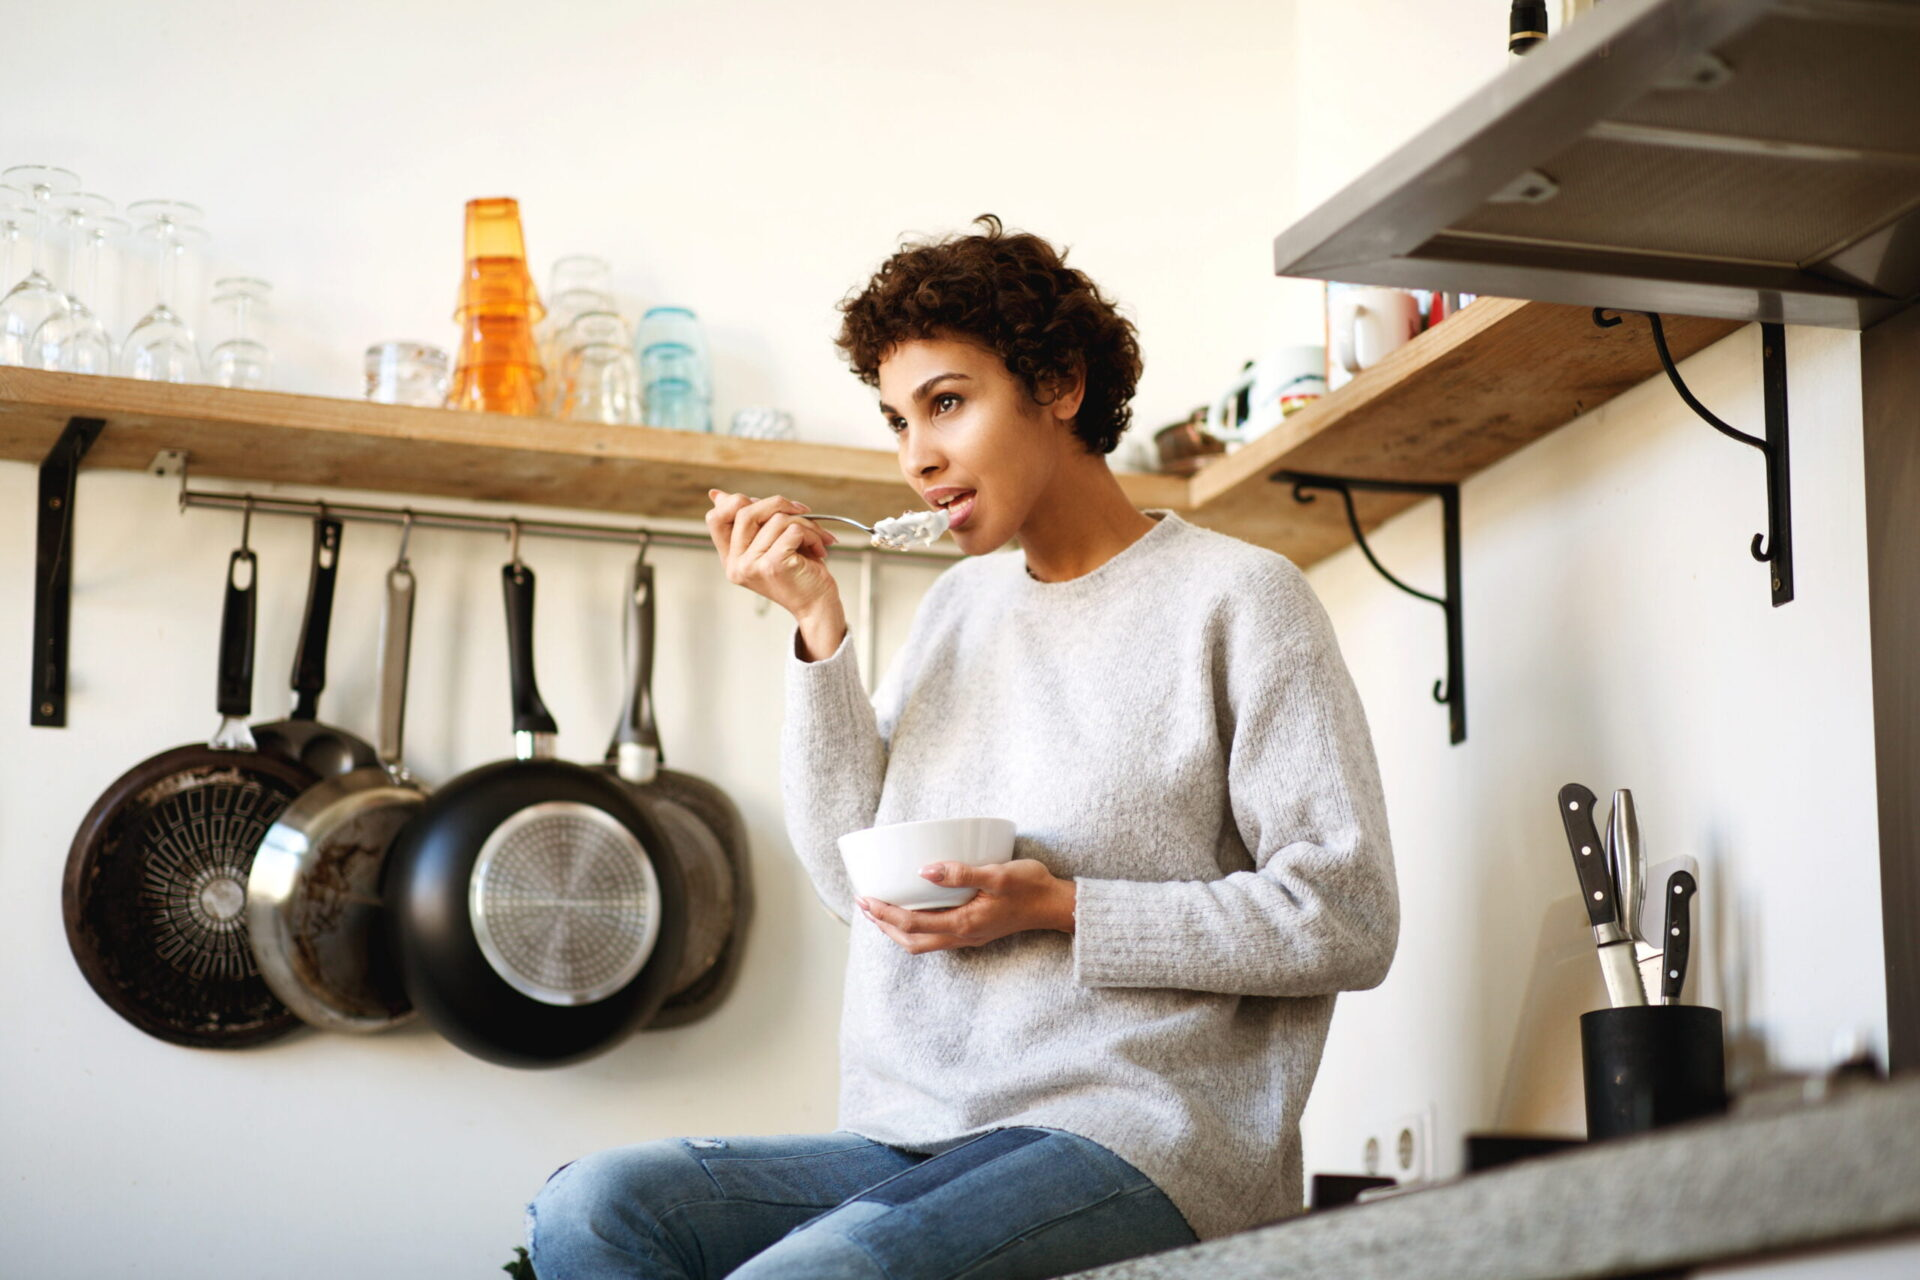 woman sitting on kitchen counter eating yogurt